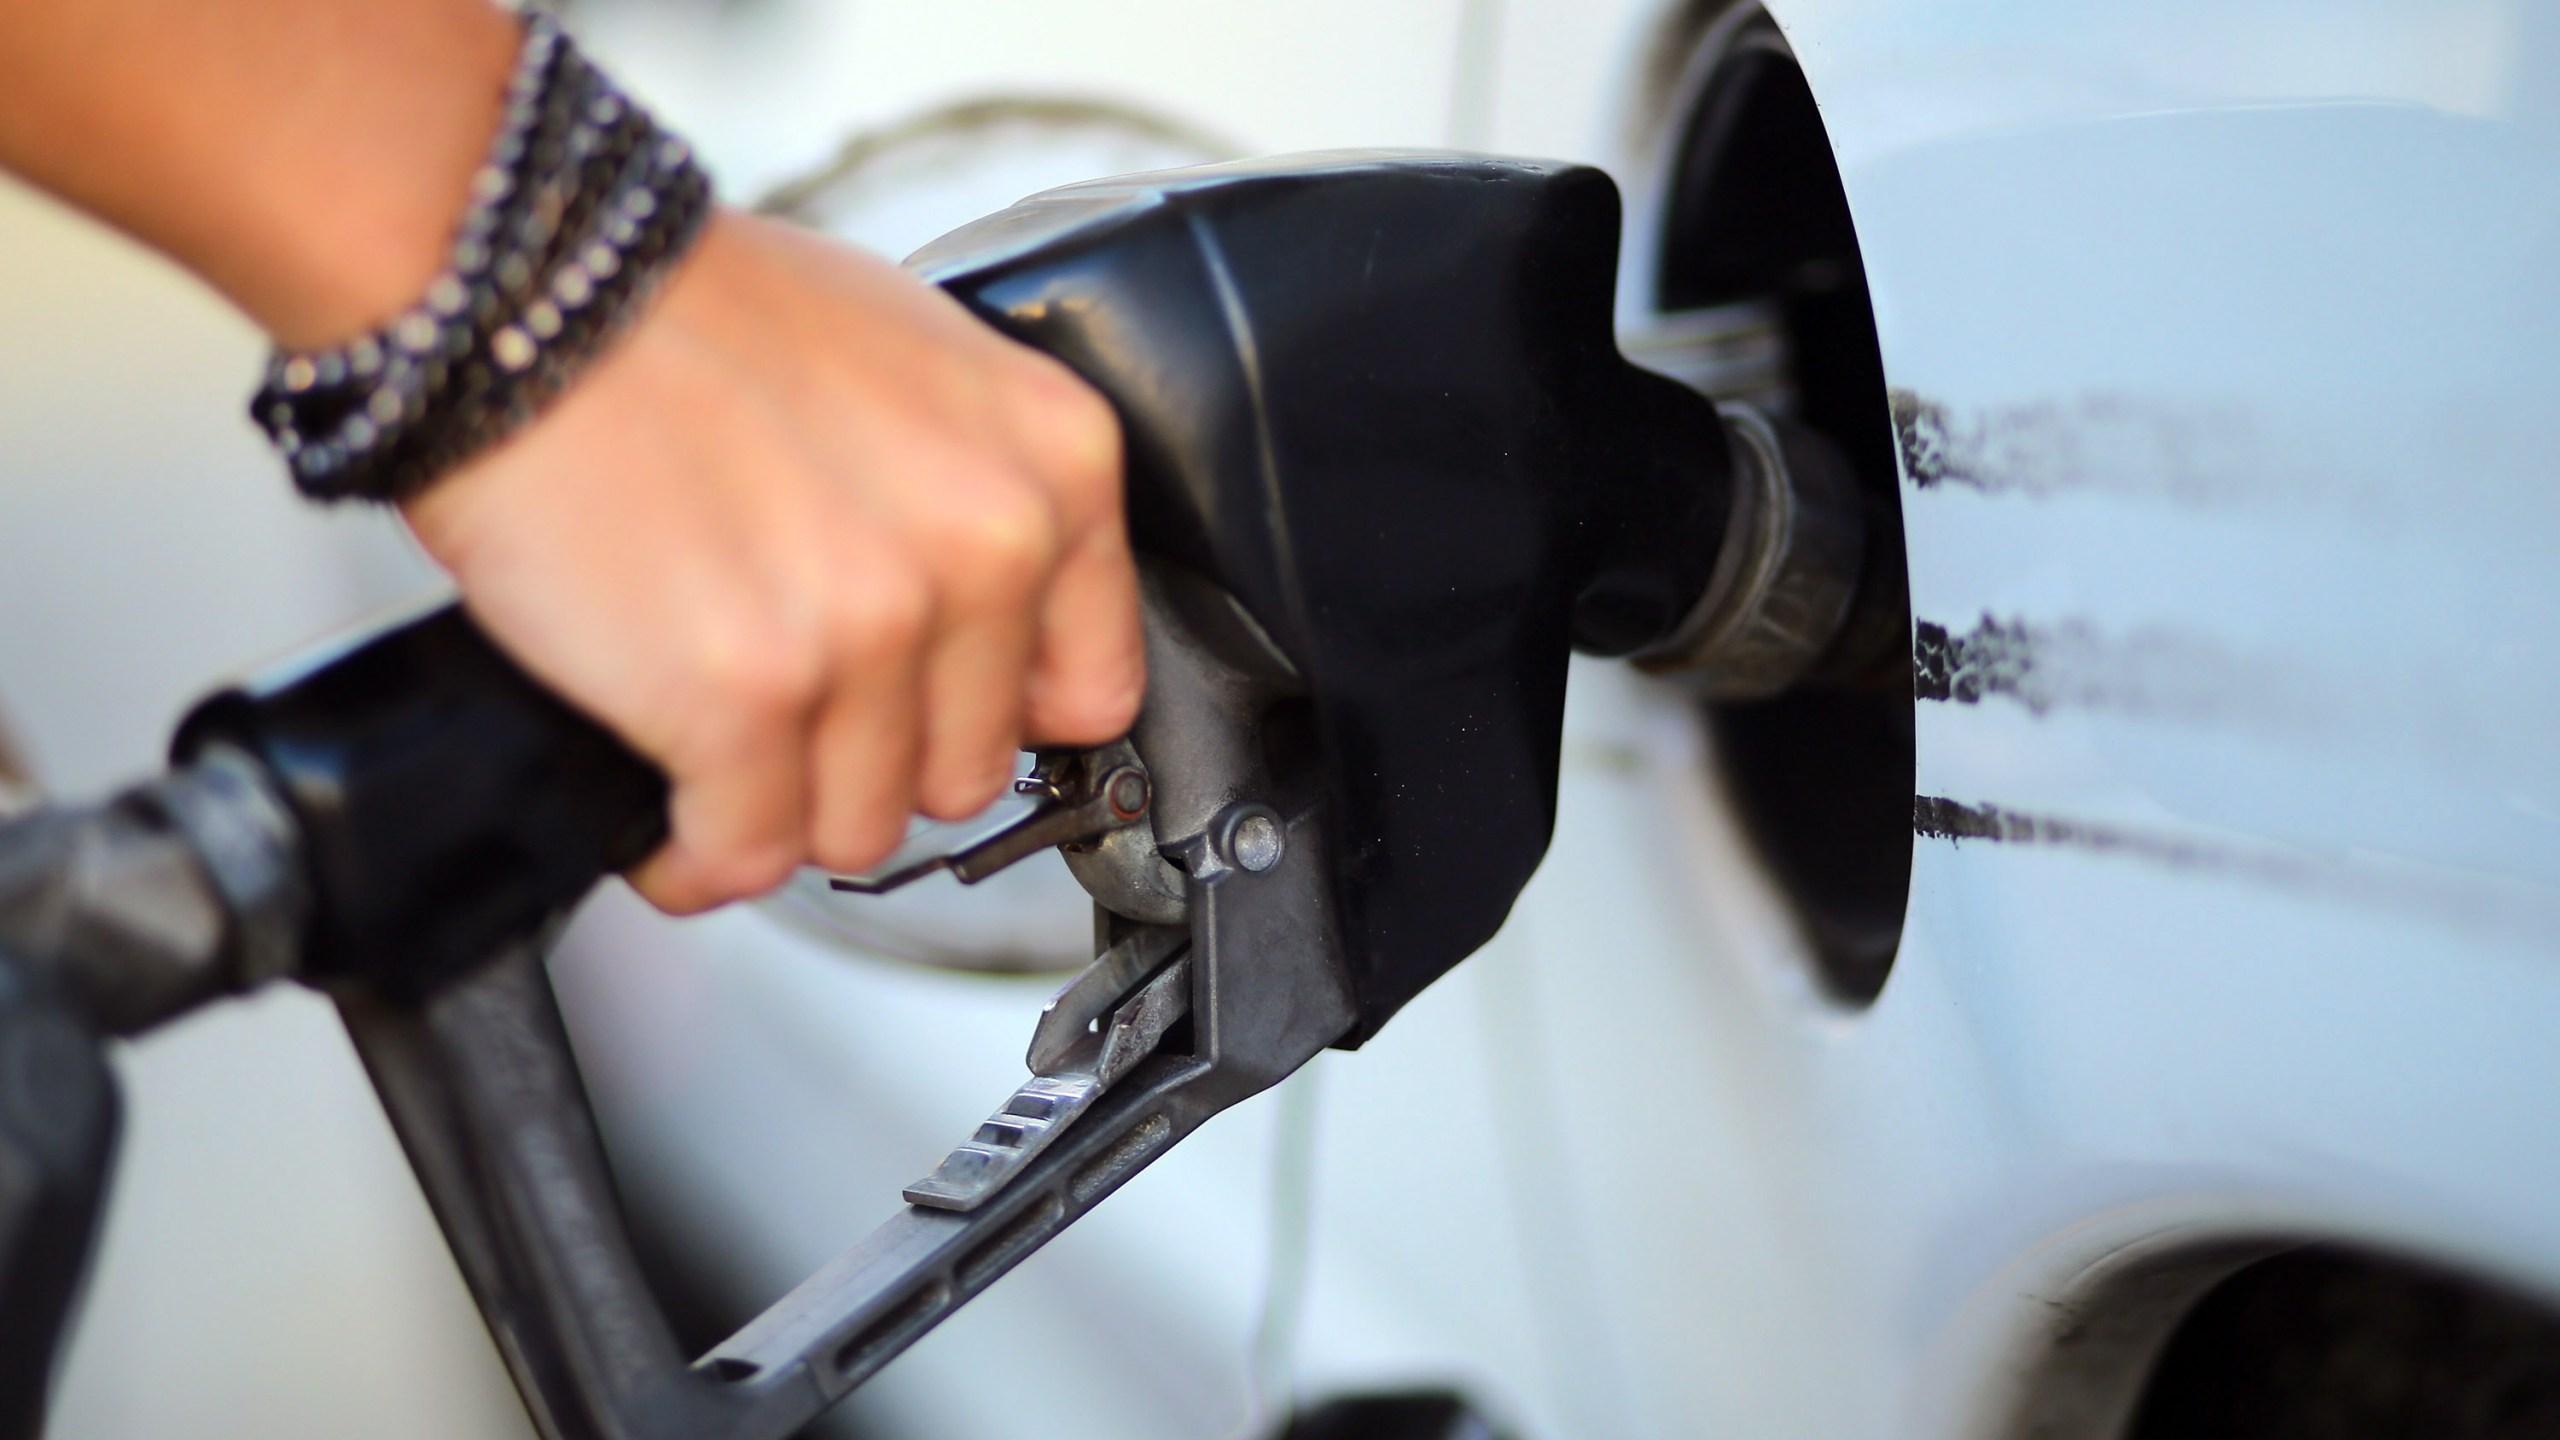 Gas Pump Nozzle (Getty Images 2)